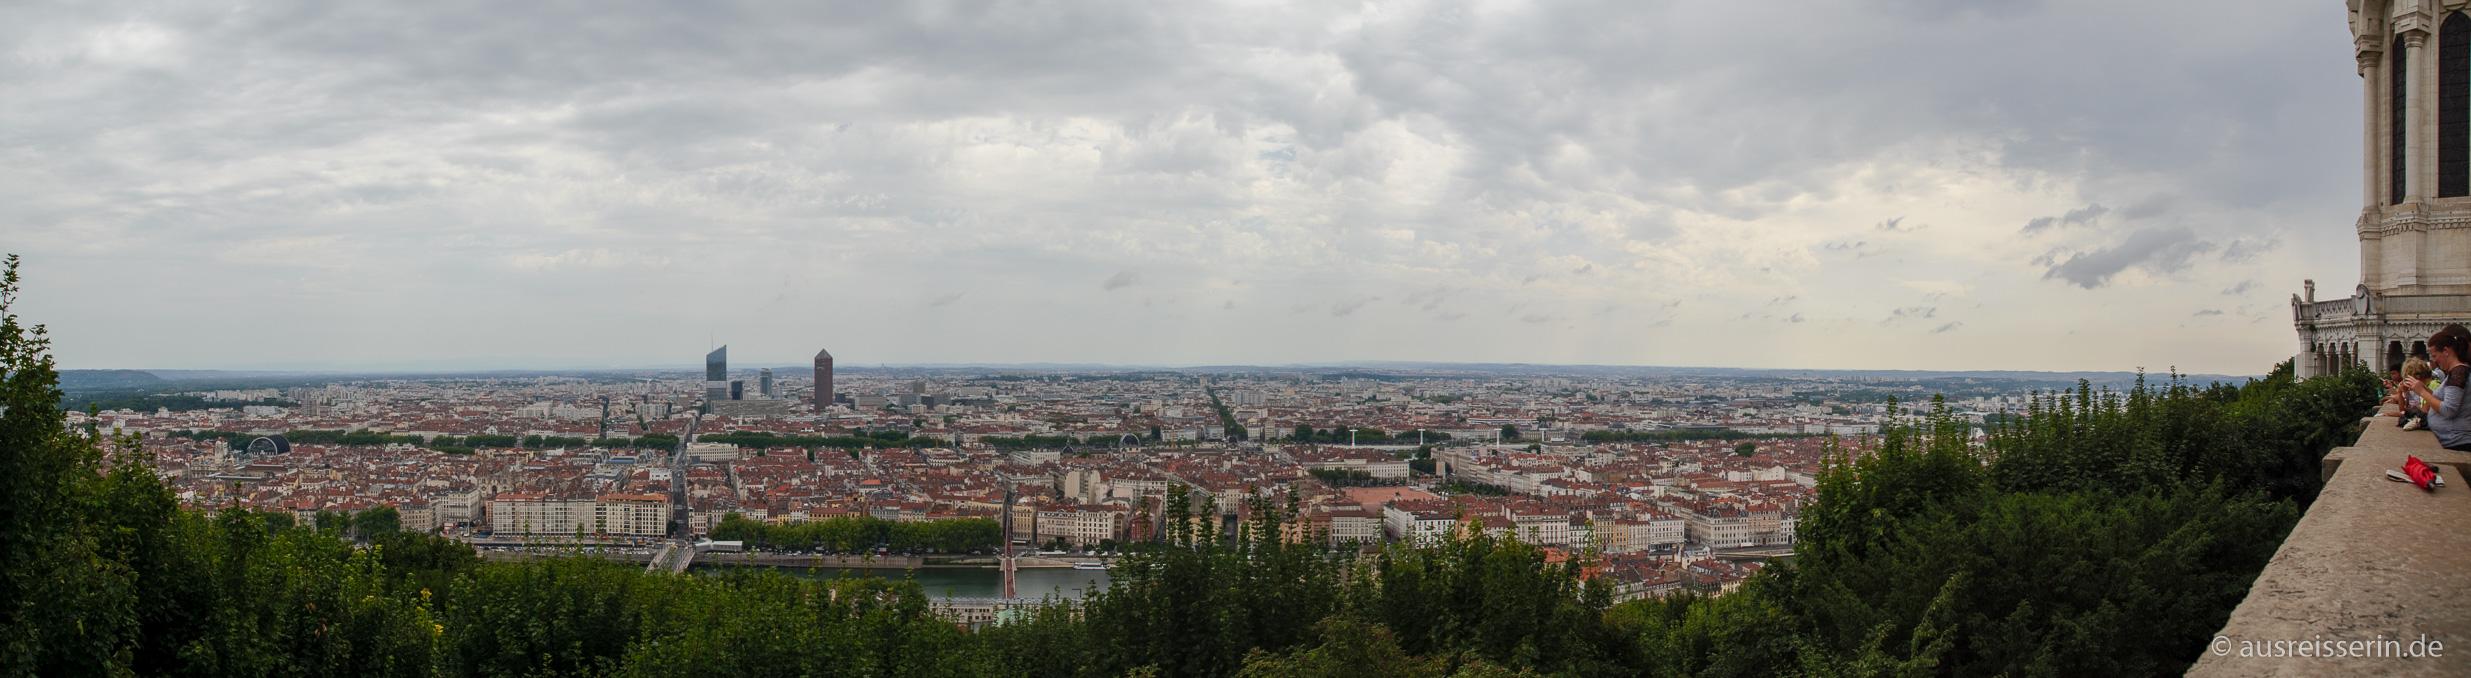 Panoramablick über Lyon